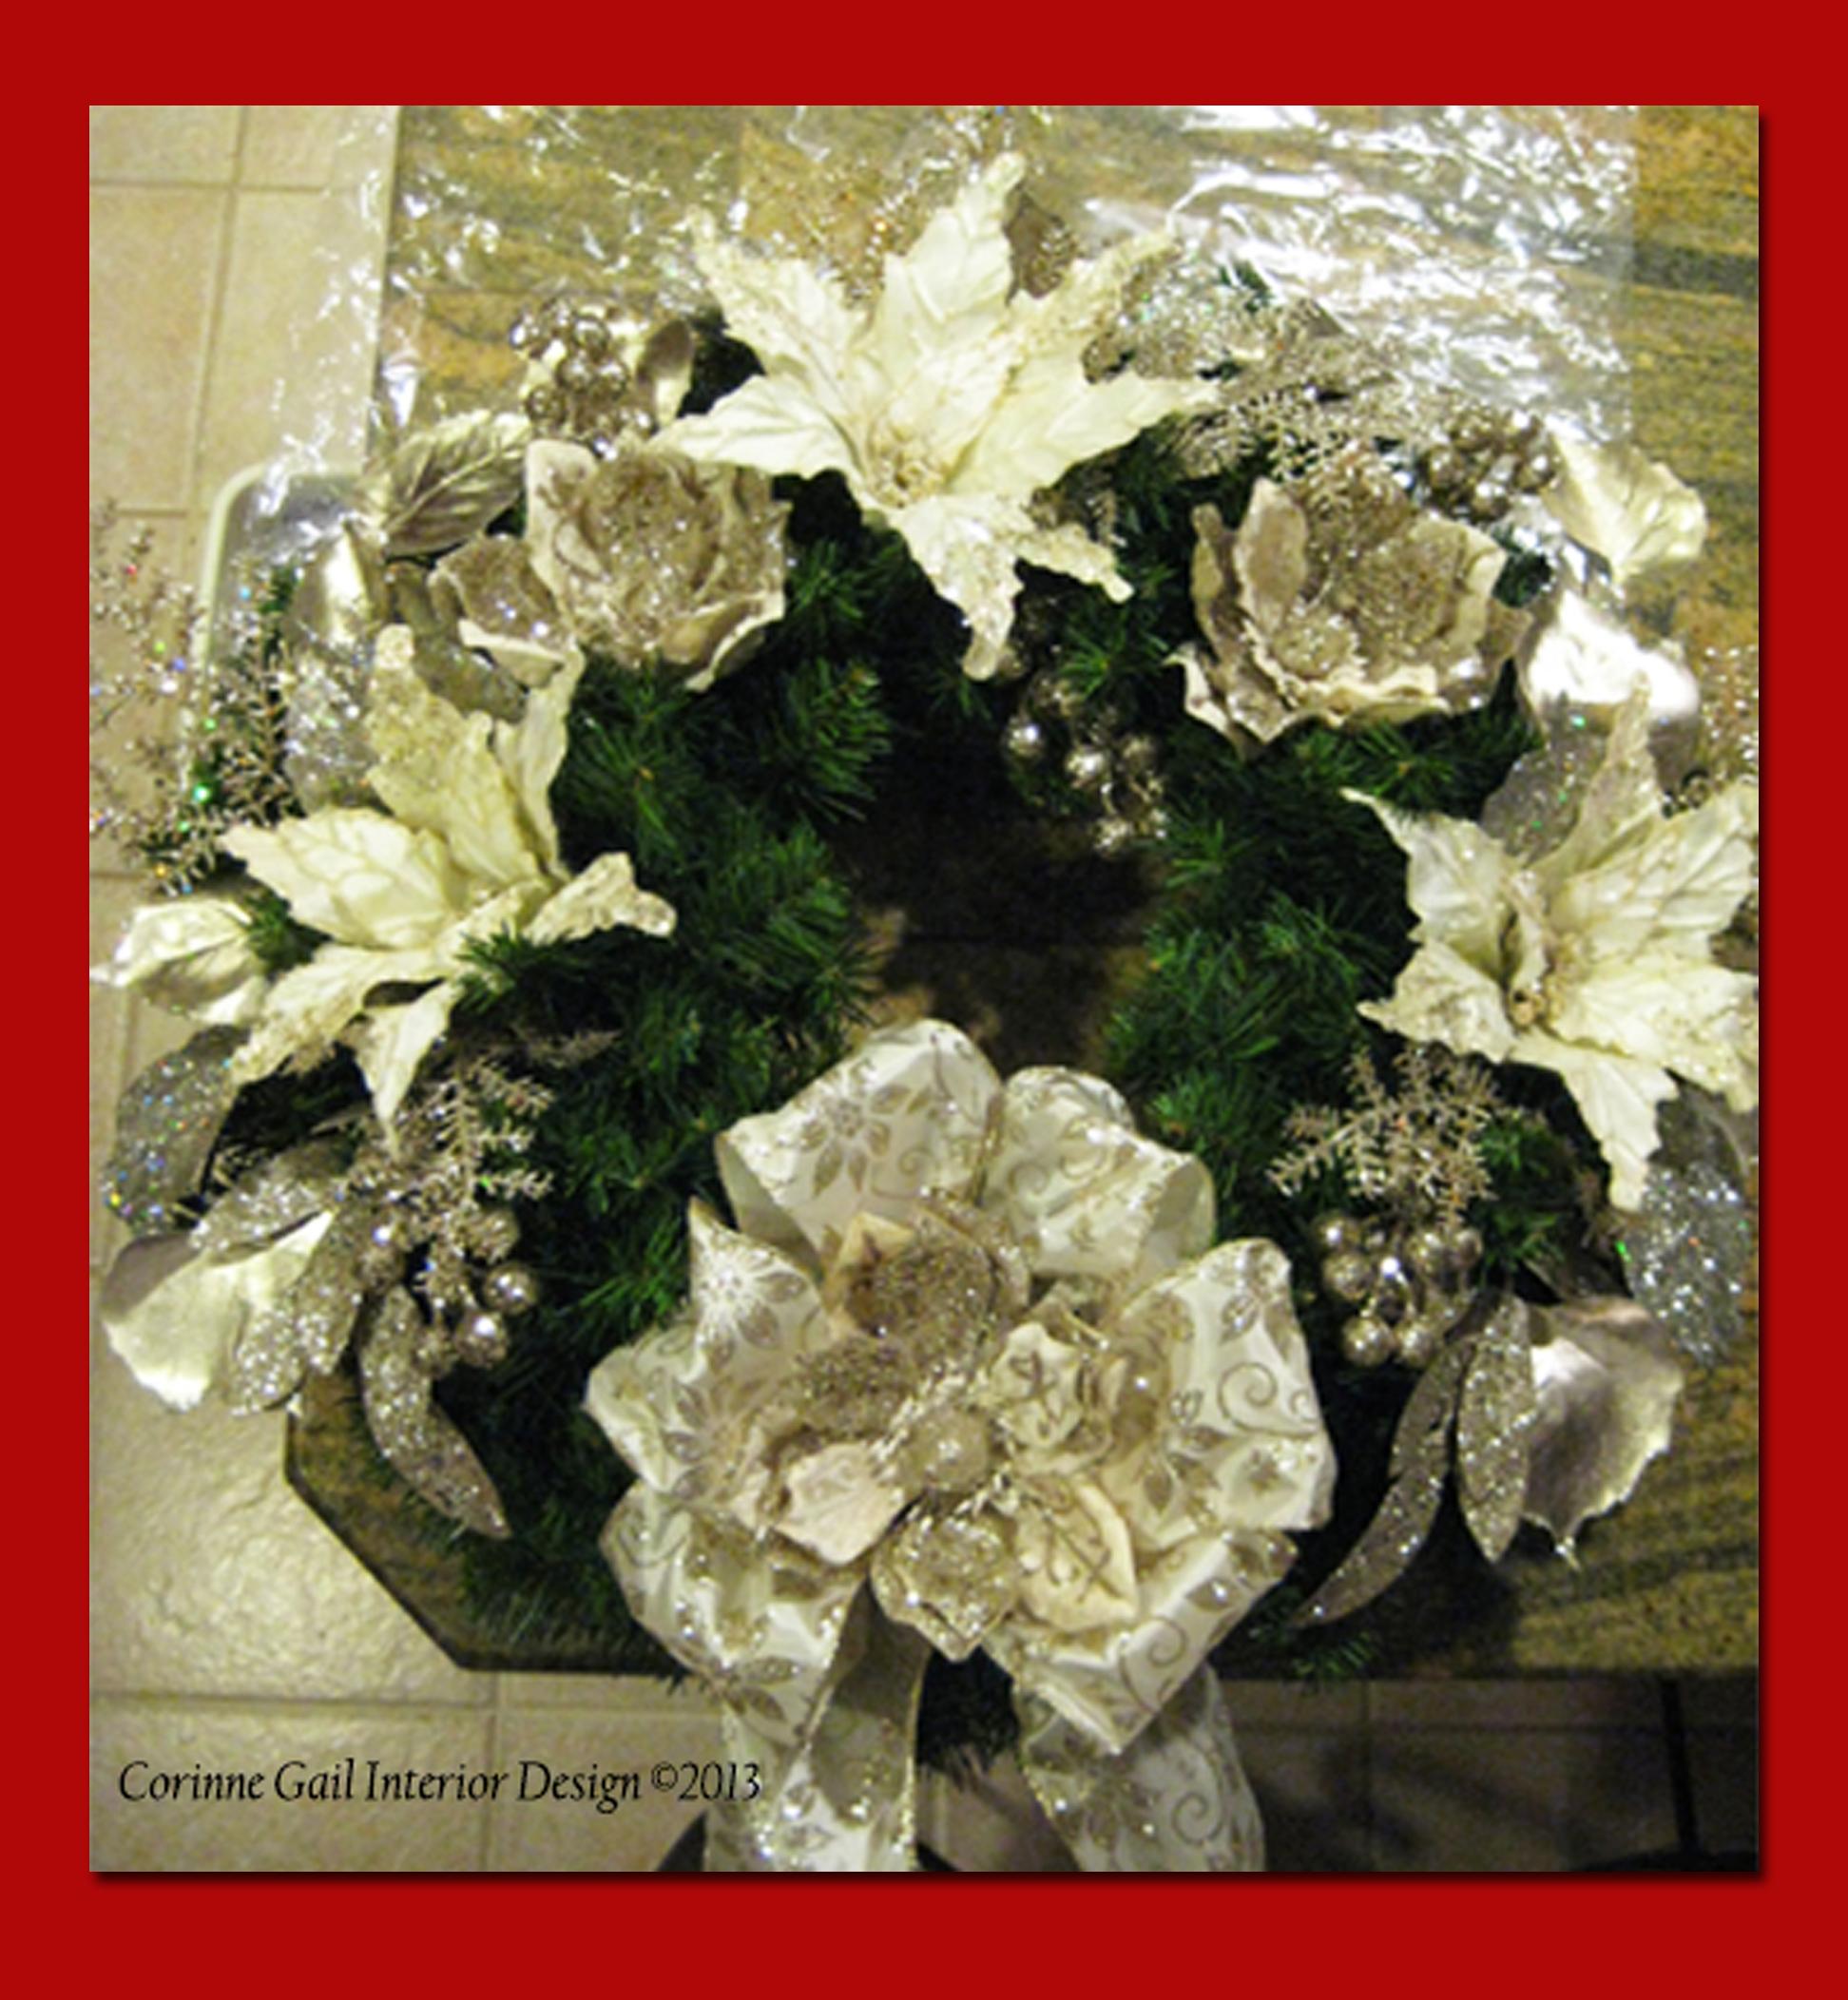 Create a Designer Christmas Wreath 171 Corinne Gail Interior Design